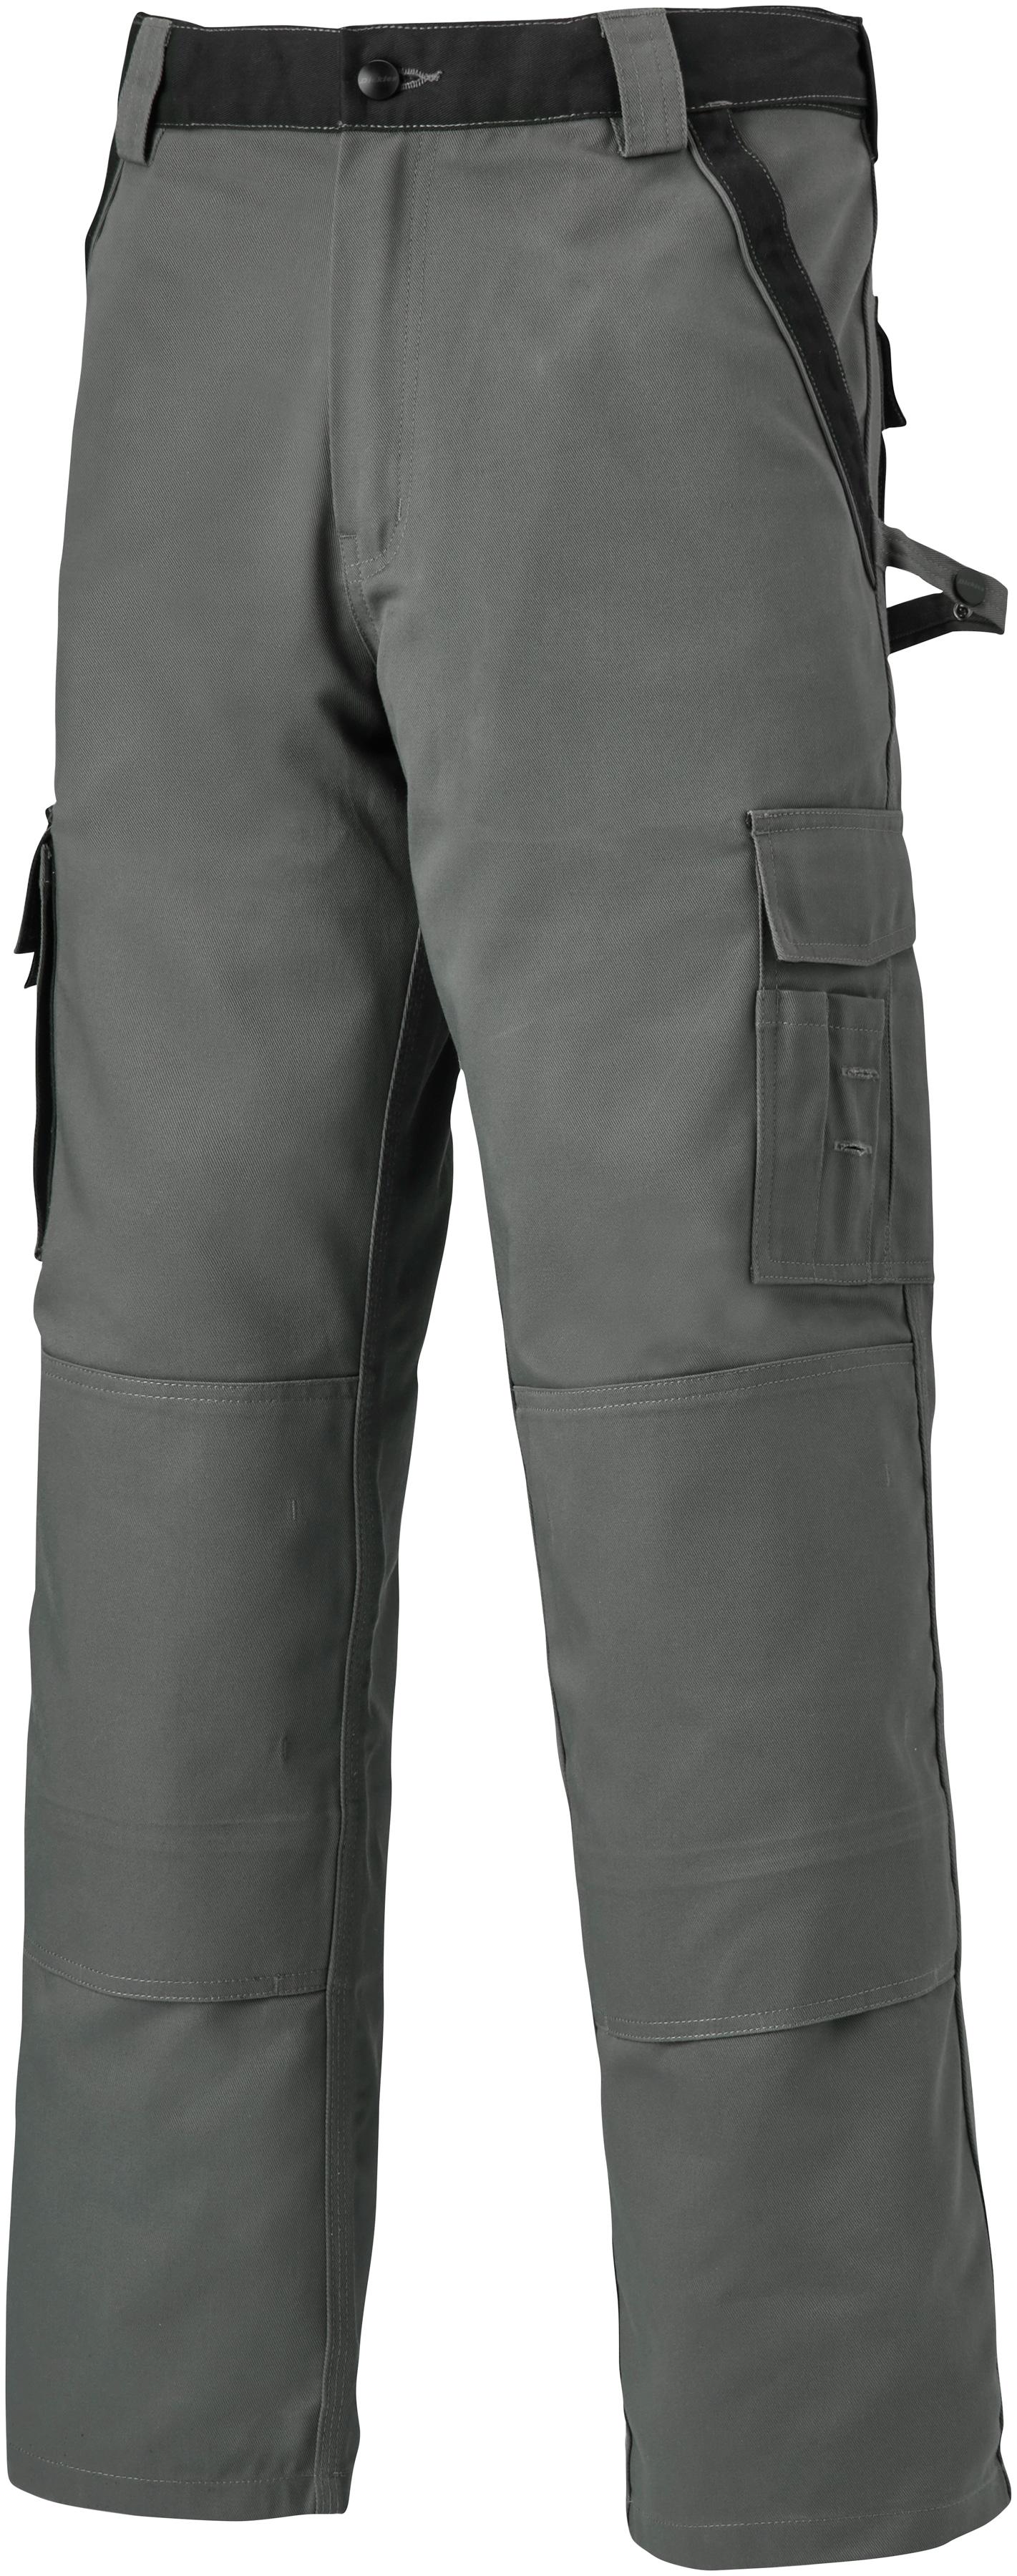 Dickies Arbeitshose Industry Bundhose 2.0, weite Passform grau Herren Arbeitshosen Arbeits- Berufsbekleidung